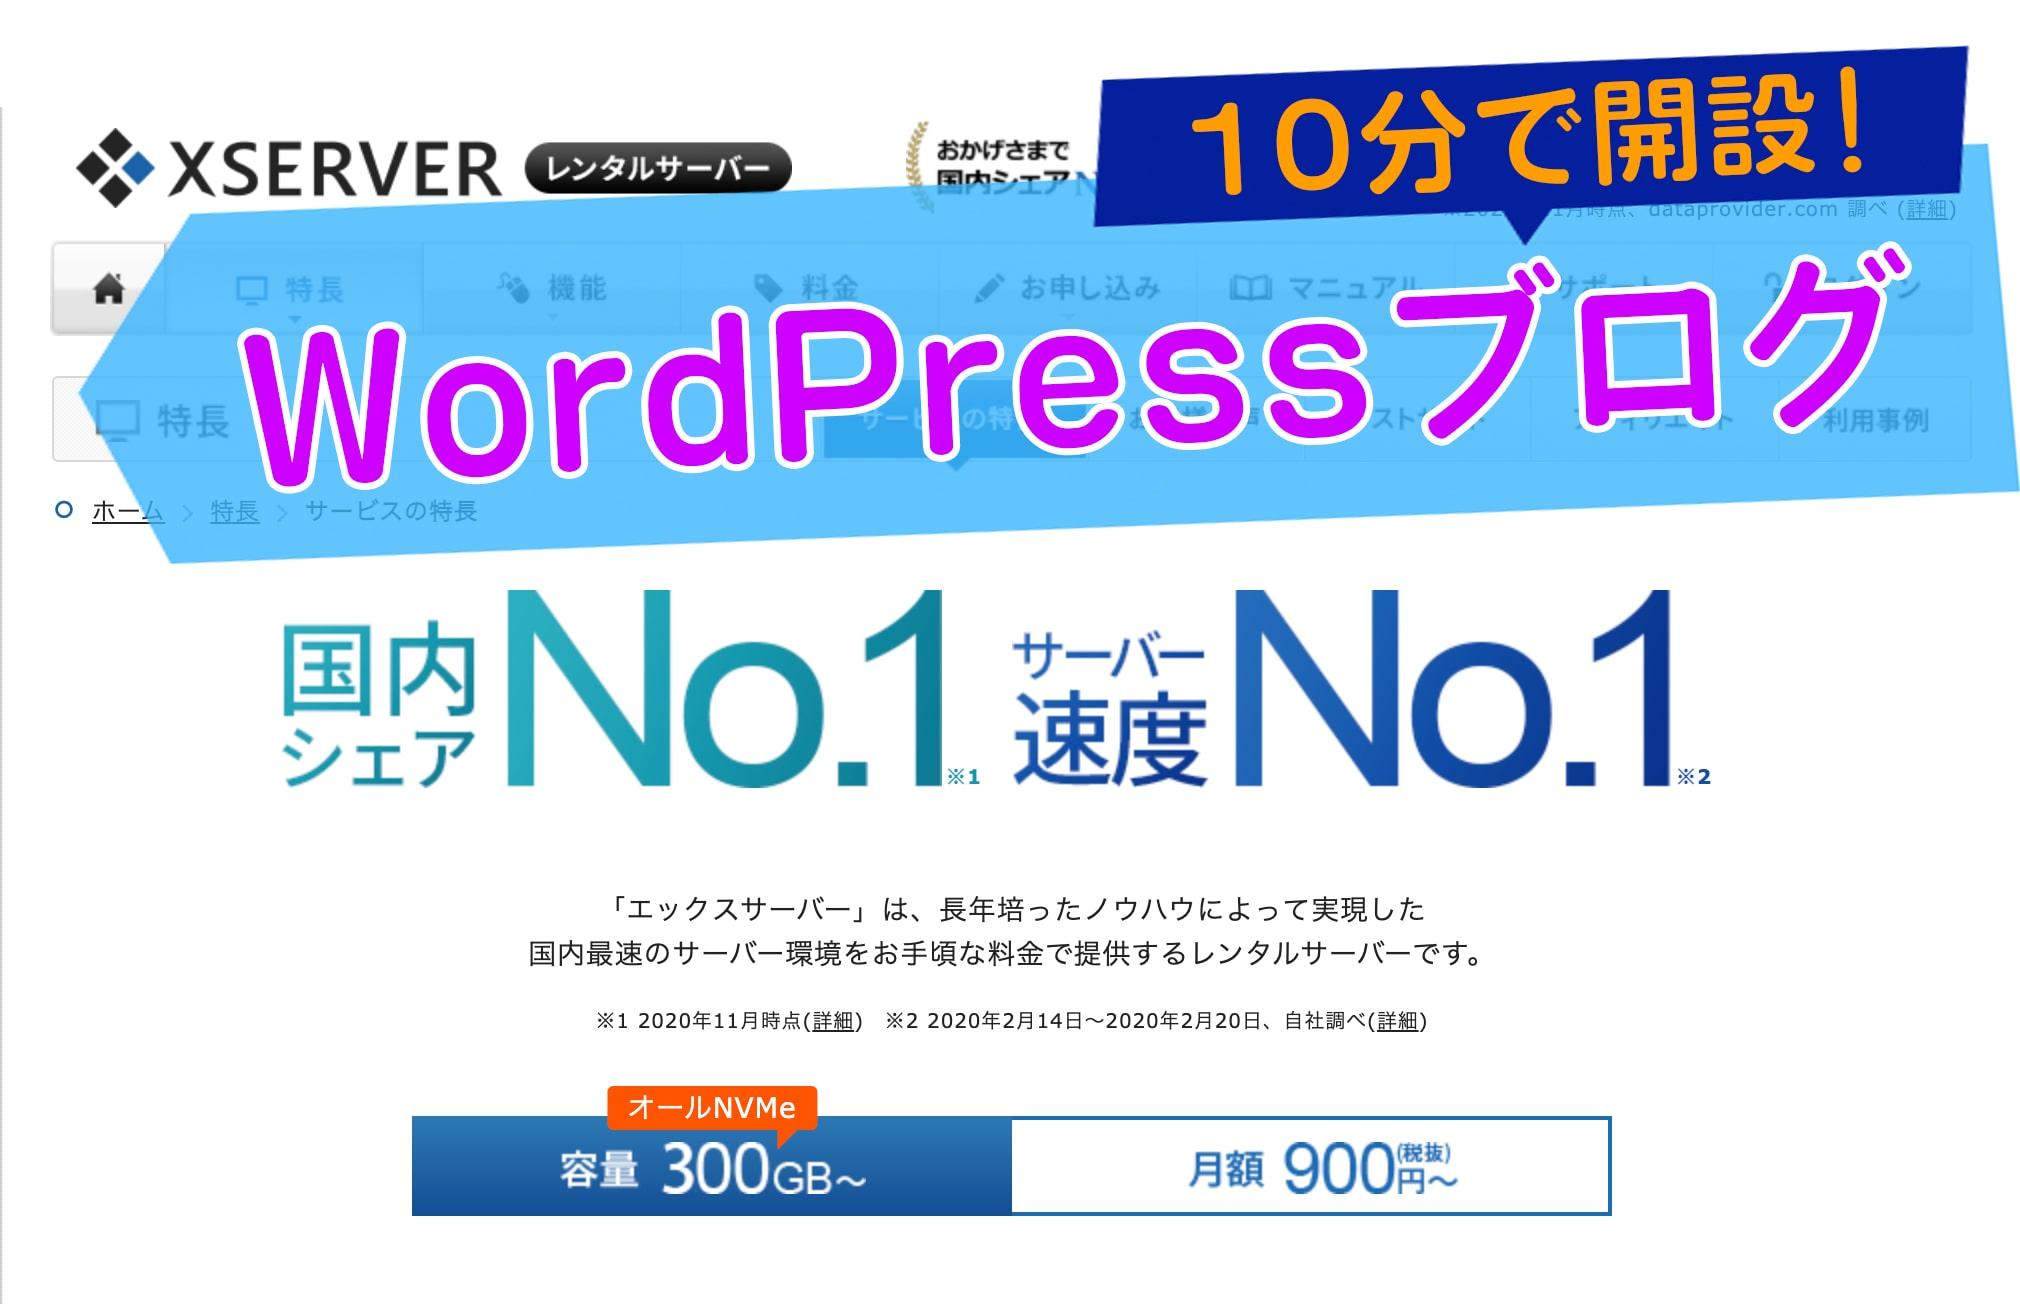 WordPressクイックスタートで簡単ブログ開設。初心者でも10分!一番基本の始め方